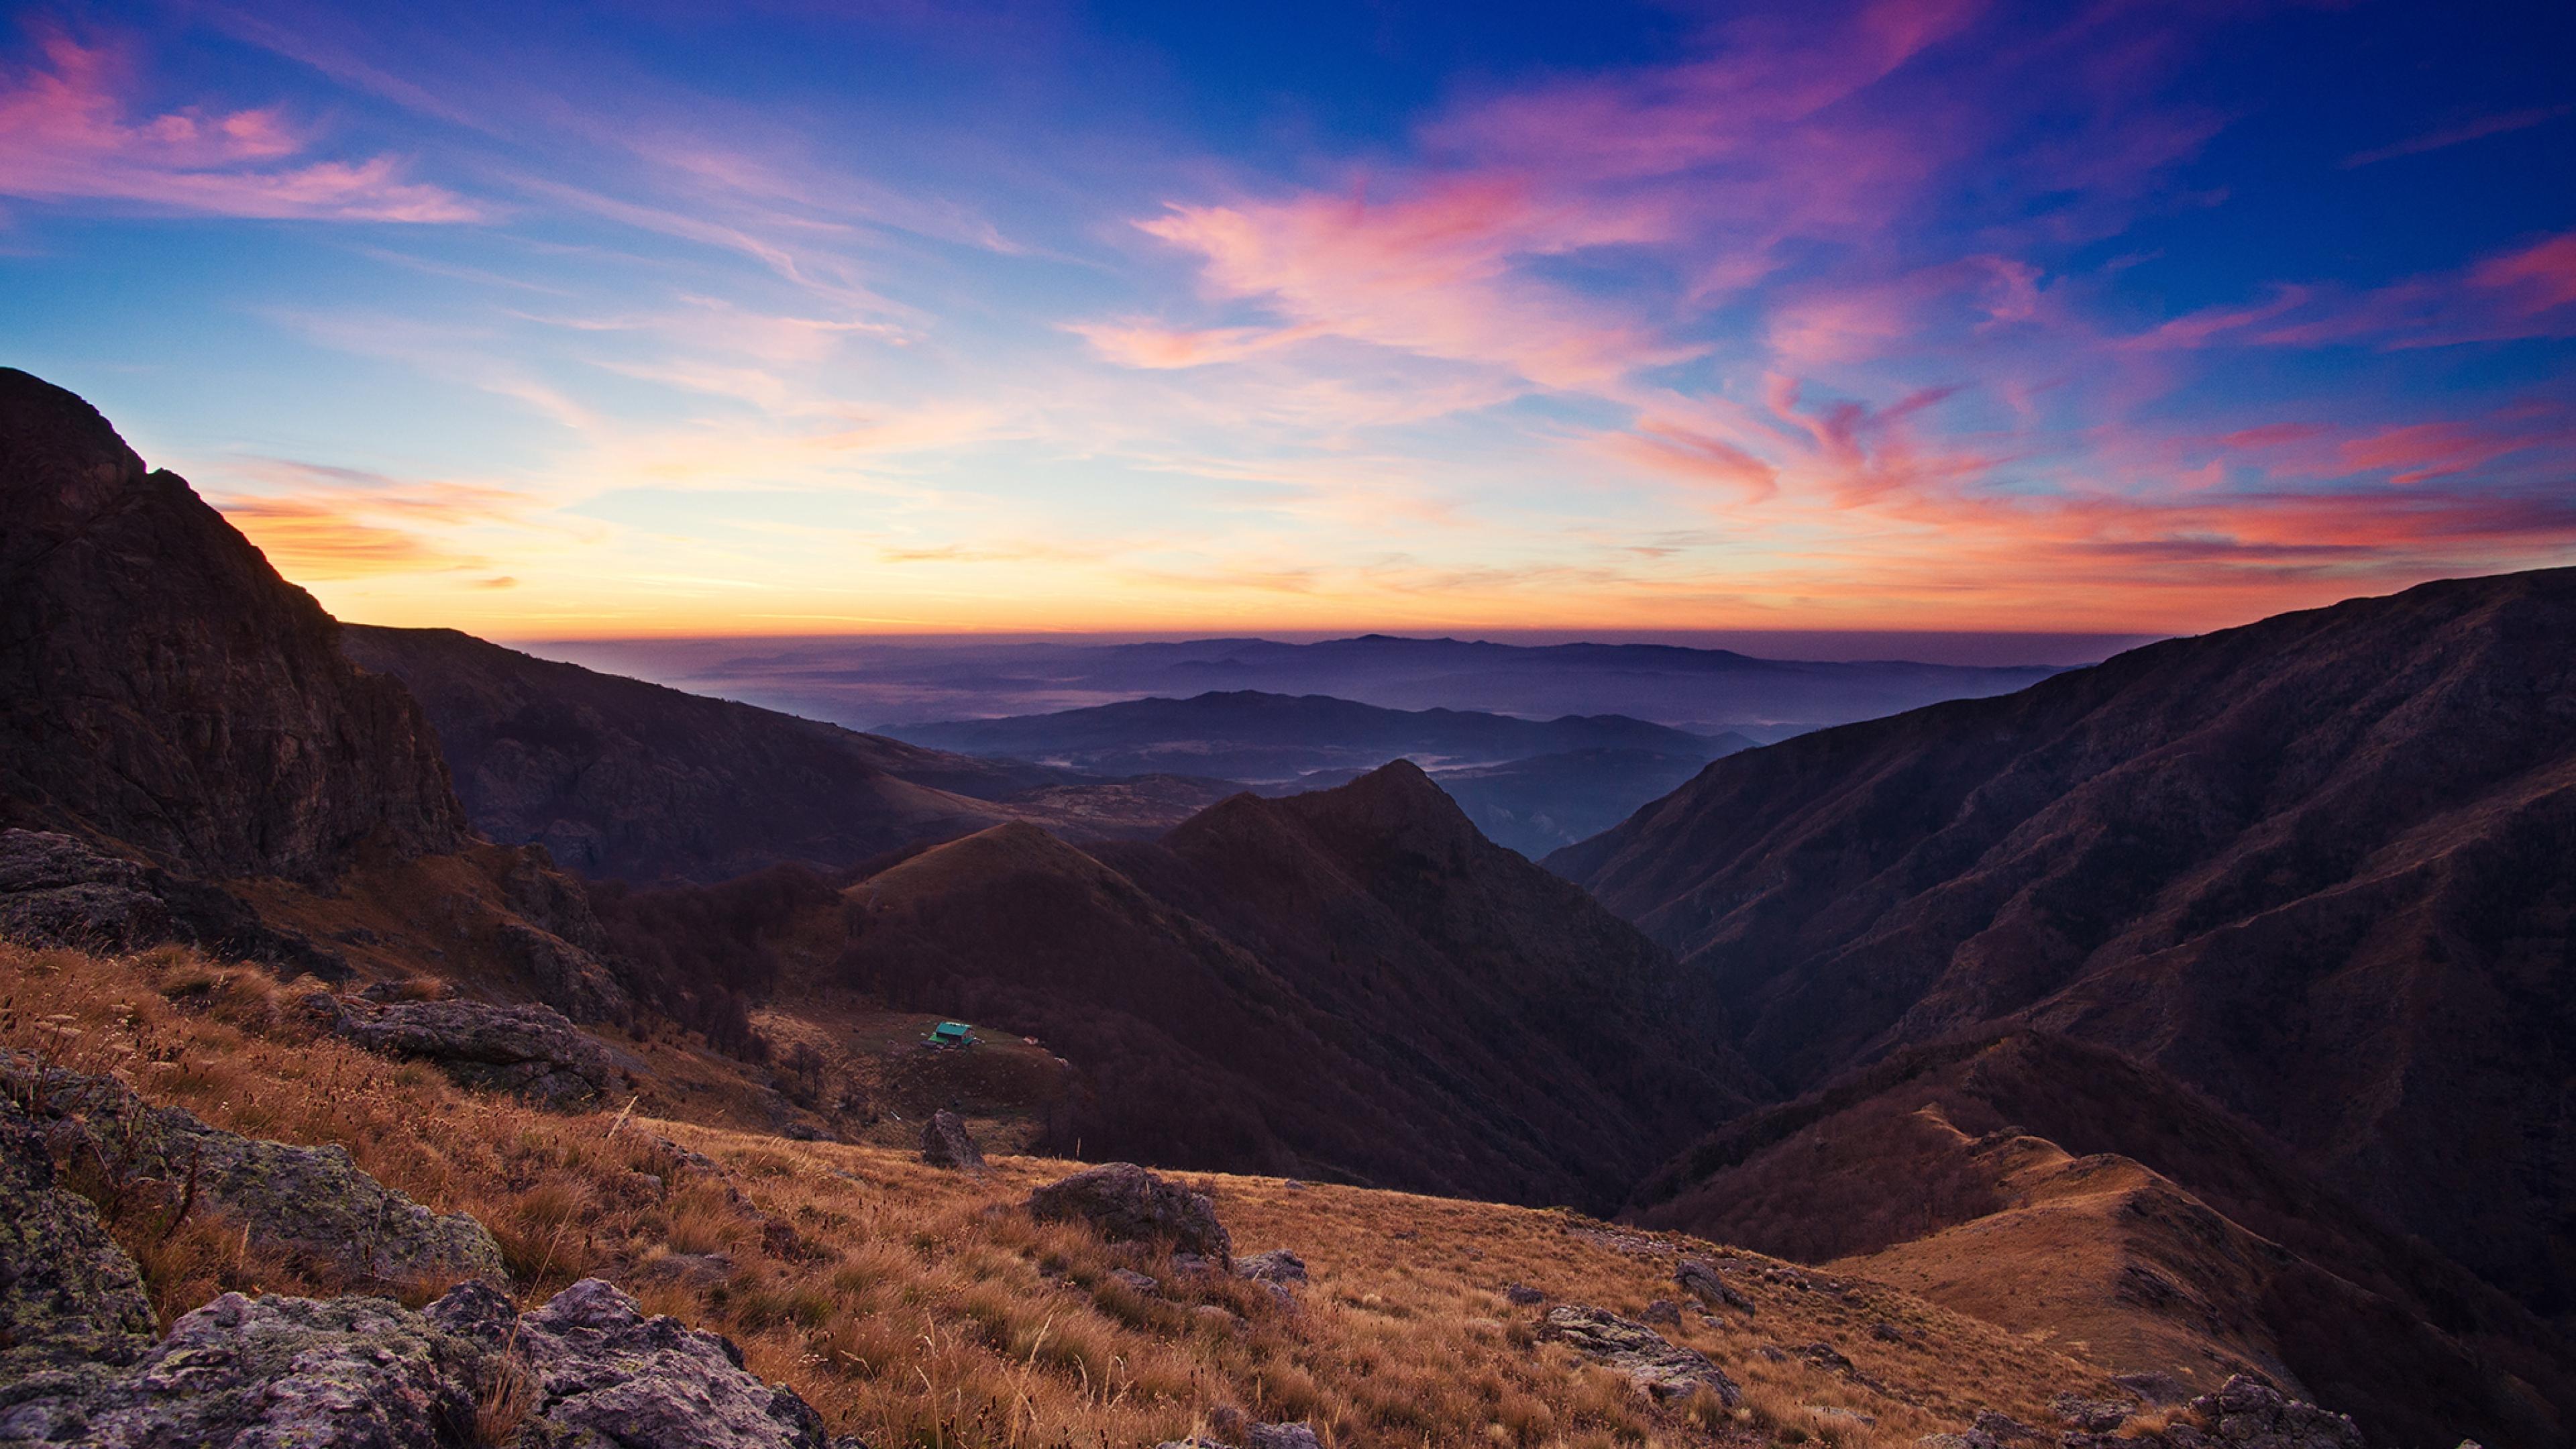 bulgaria balkans mountains 1535923549 - Bulgaria Balkans Mountains - nature wallpapers, mountains wallpapers